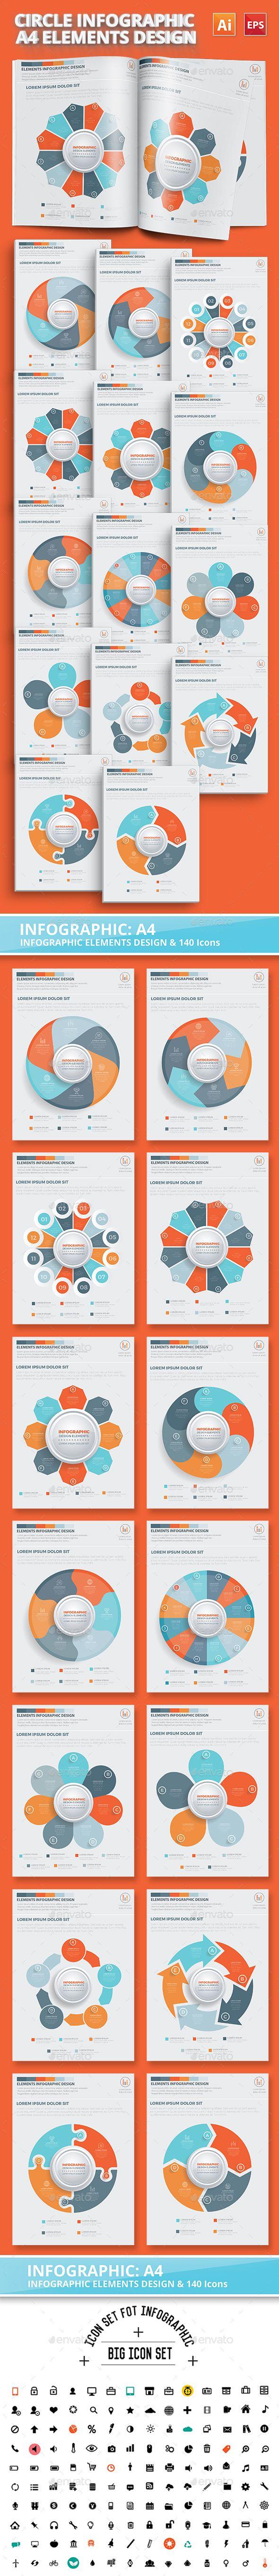 Circle Chart Infographic Design Template Vector EPS, AI Illustrator. Download here: http://graphicriver.net/item/circle-chart-infographic-design/16451598?ref=ksioks